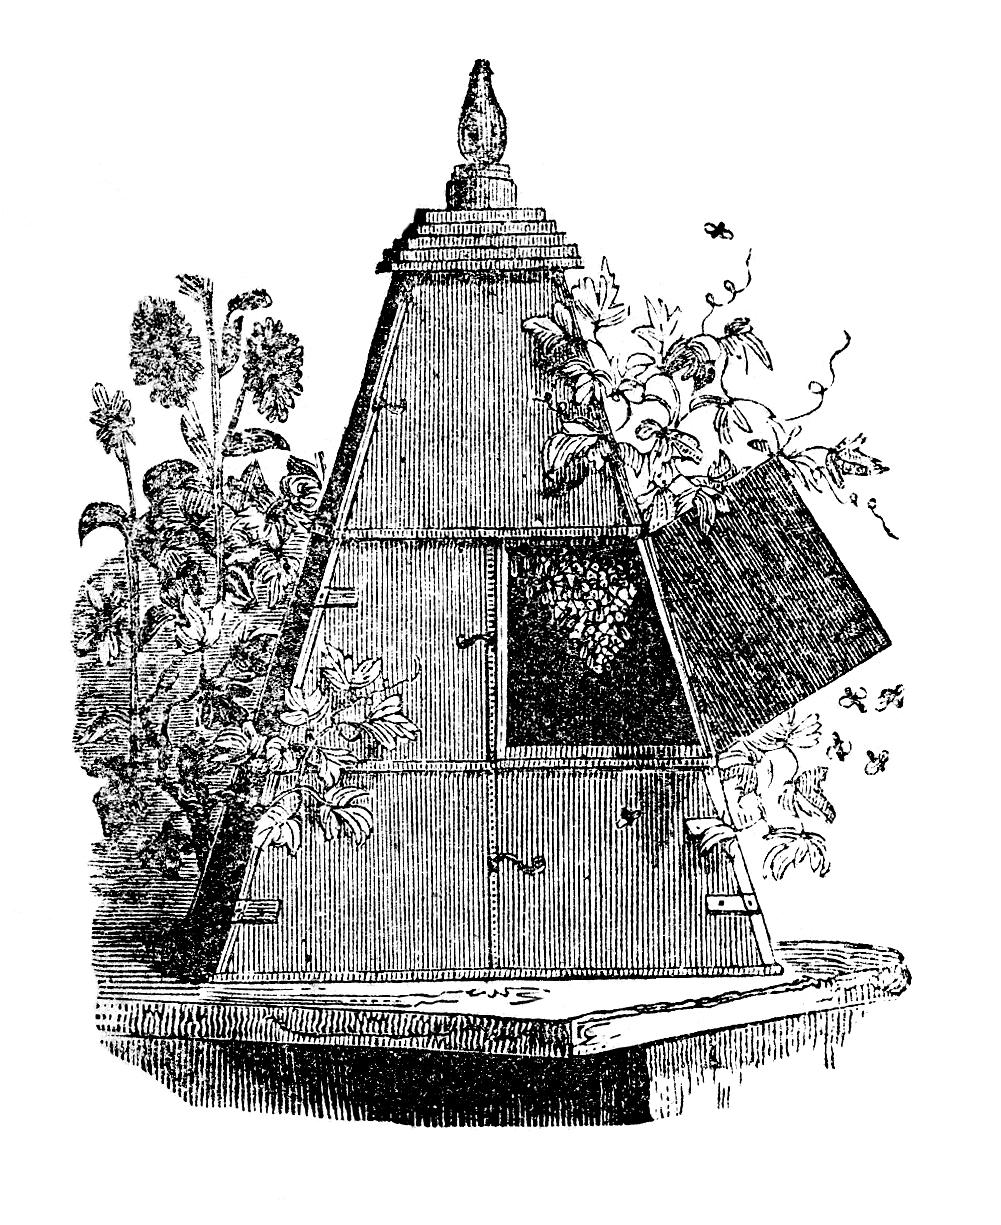 vintage-wooden-beehive-image-graphicsfairy